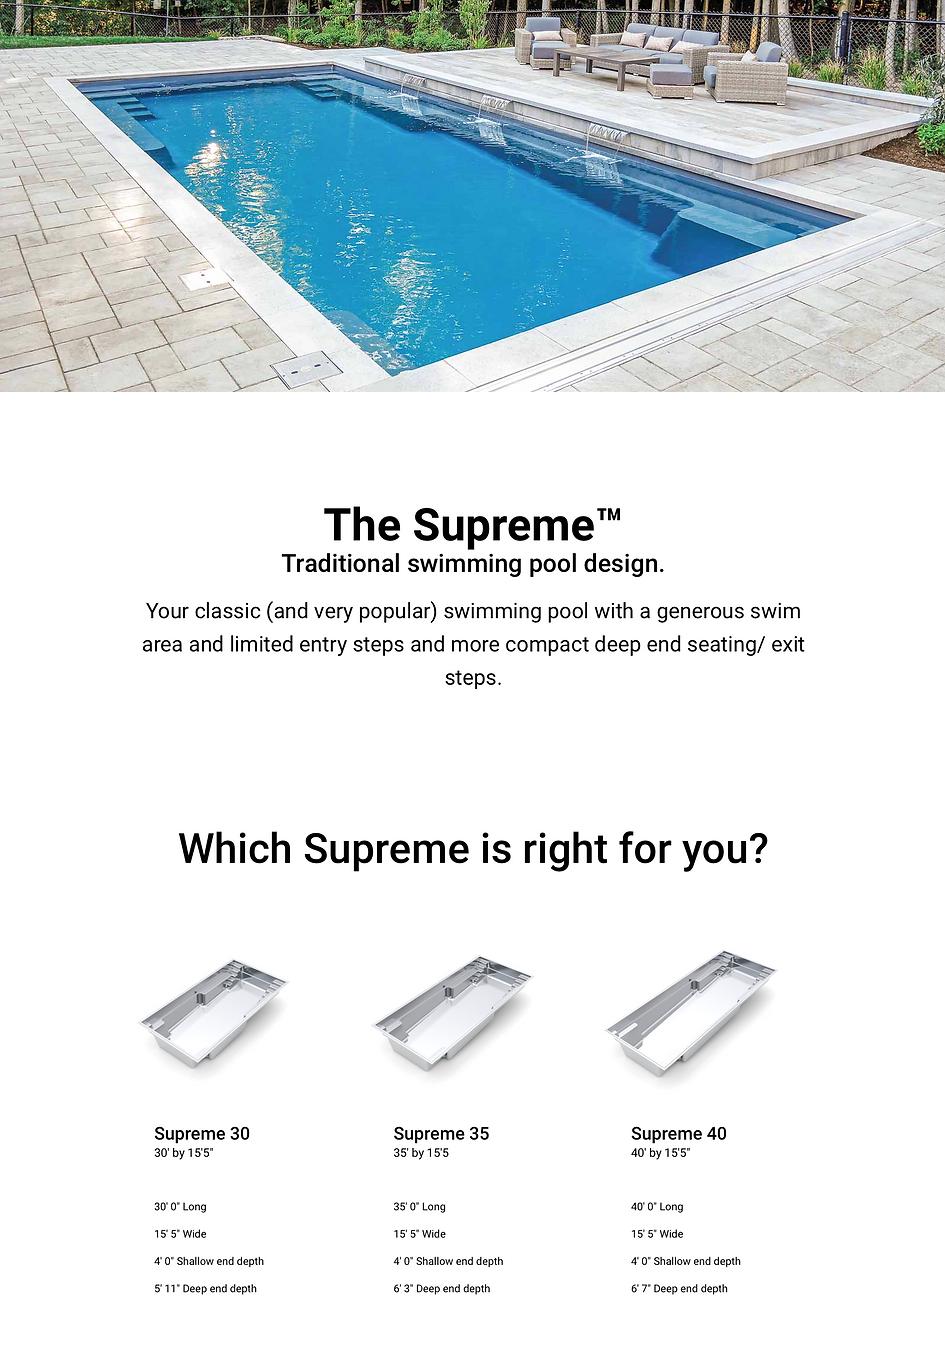 The Supreme Design.png